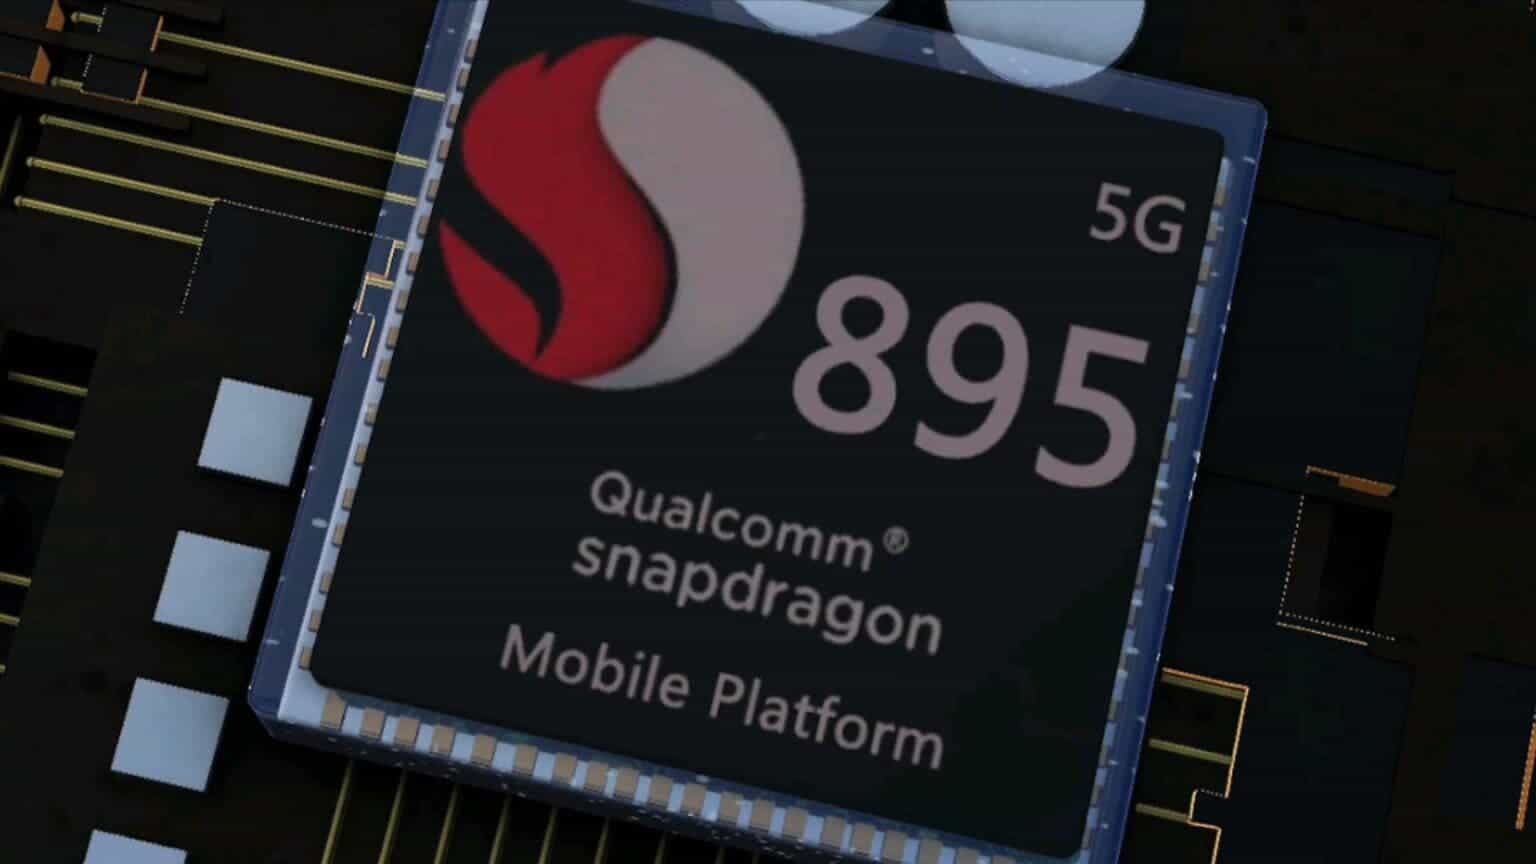 Snapdragon 895